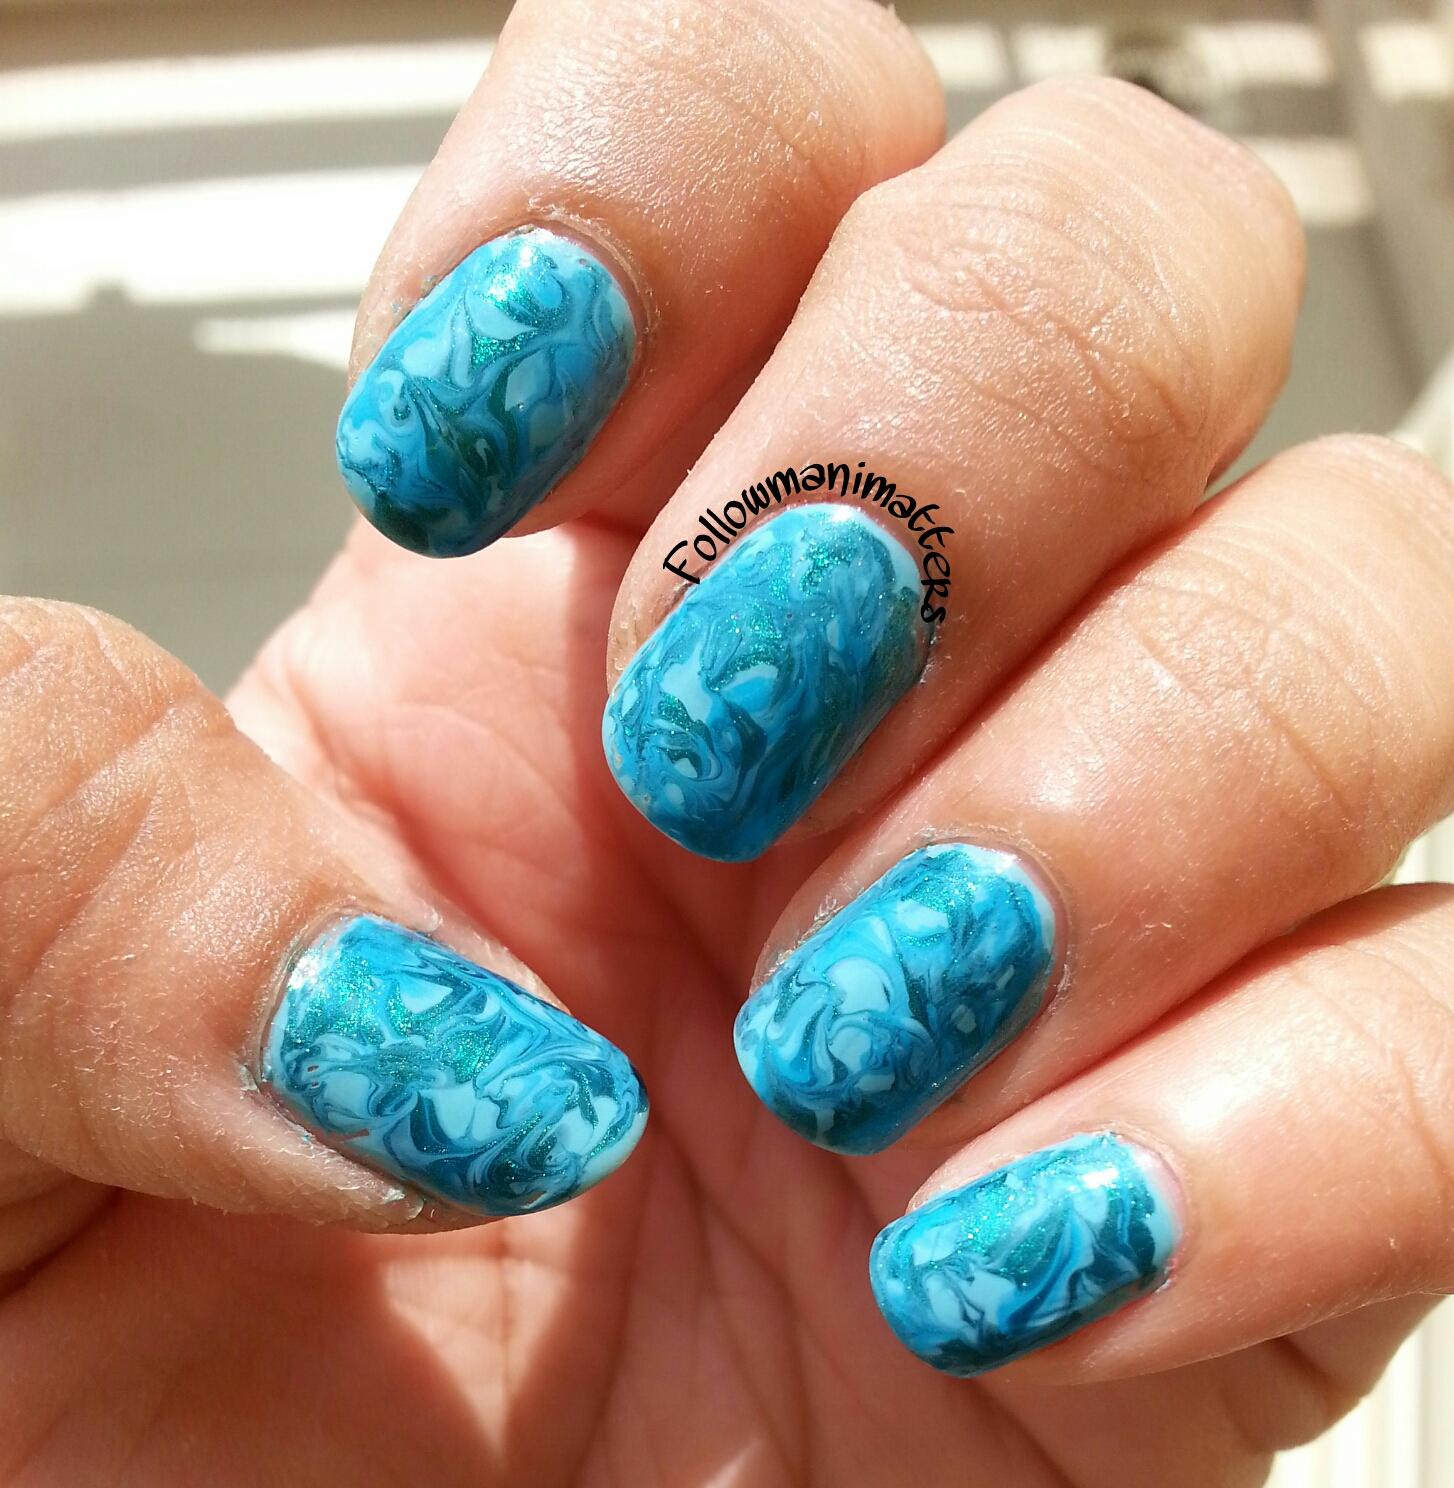 Water Marble Nail Polish Brands India: Manisha's FollowManimatters: Dry Marble Nails